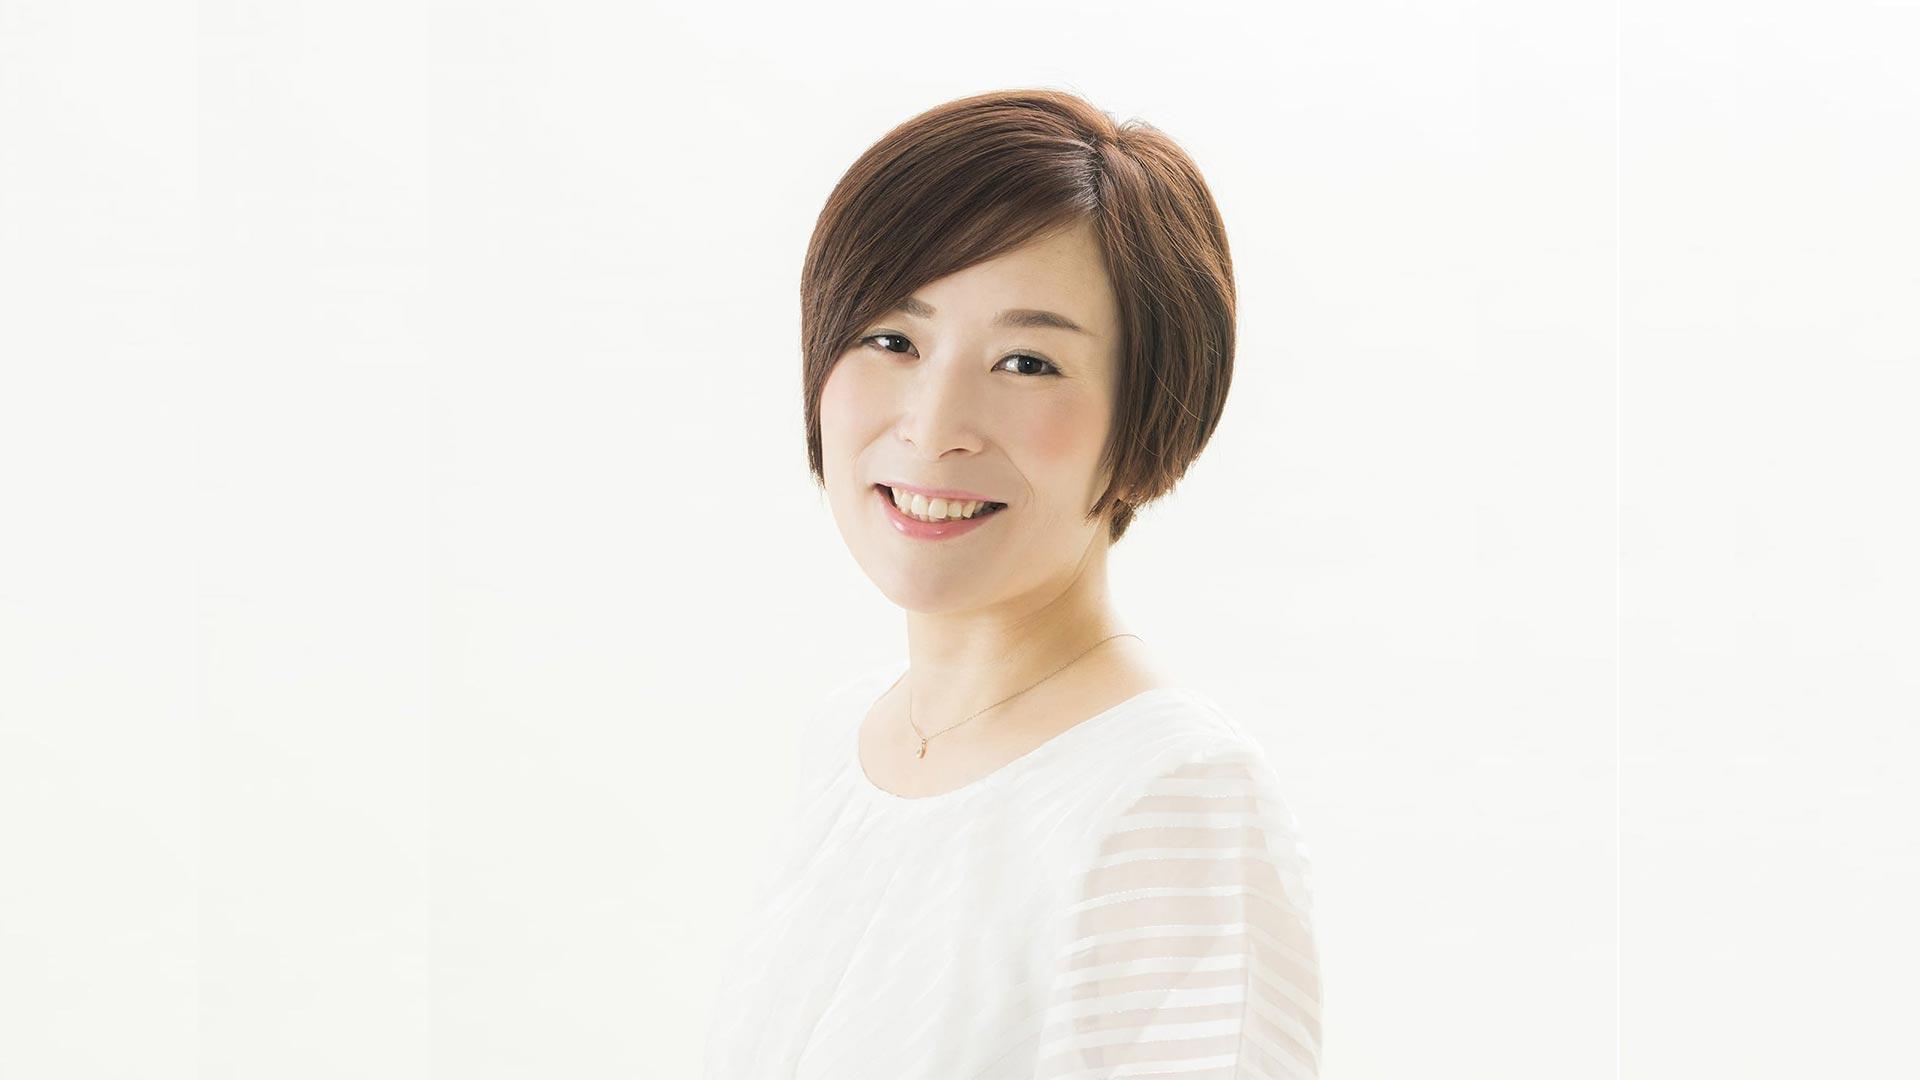 takahashi-keiko-image